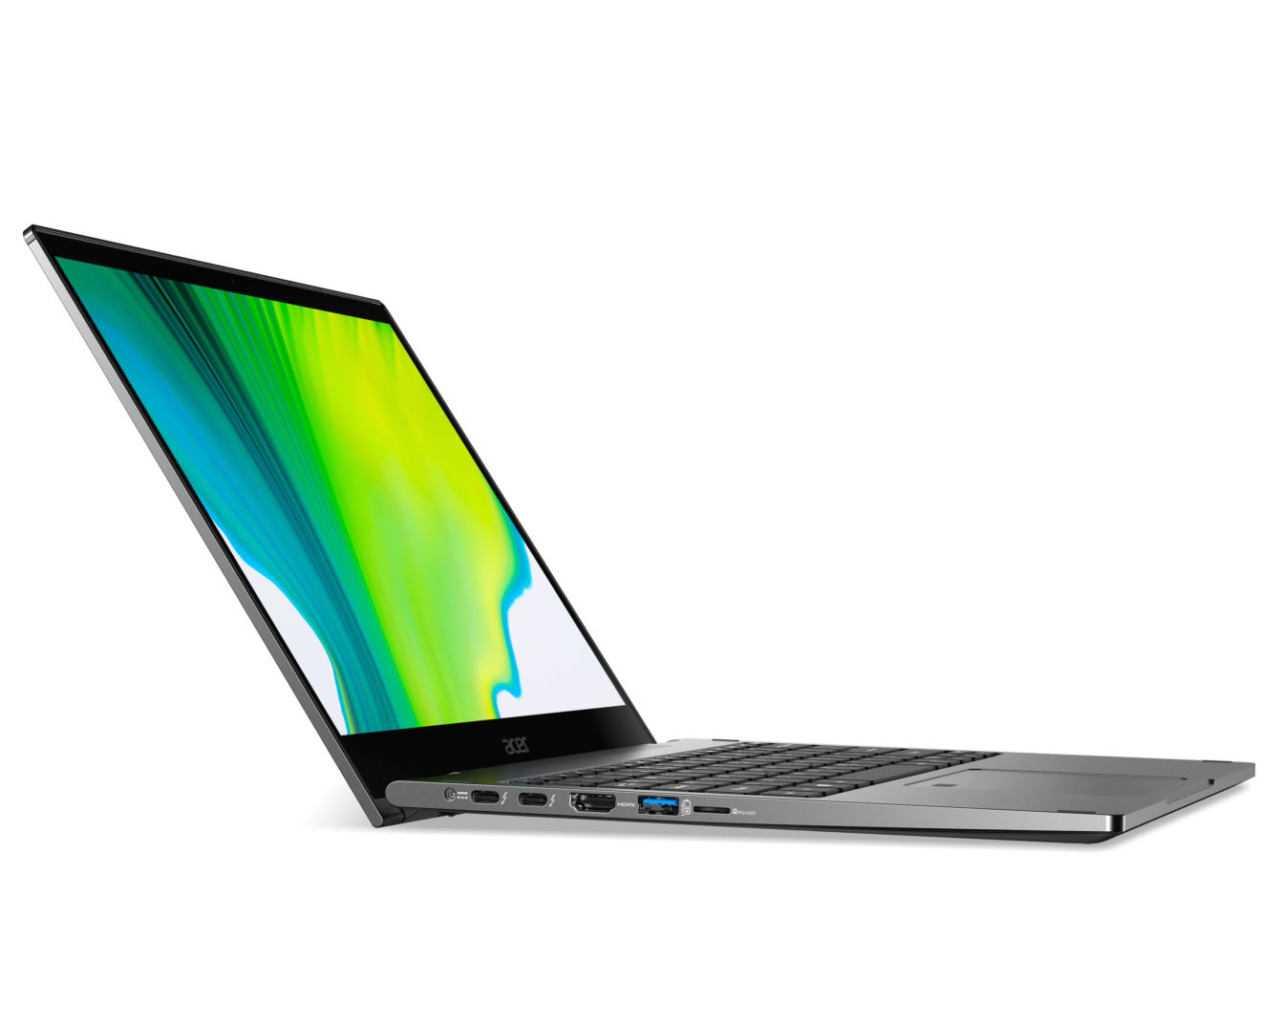 Acer Spin 5 e Acer Spin 3: sottili, versatili e potenti